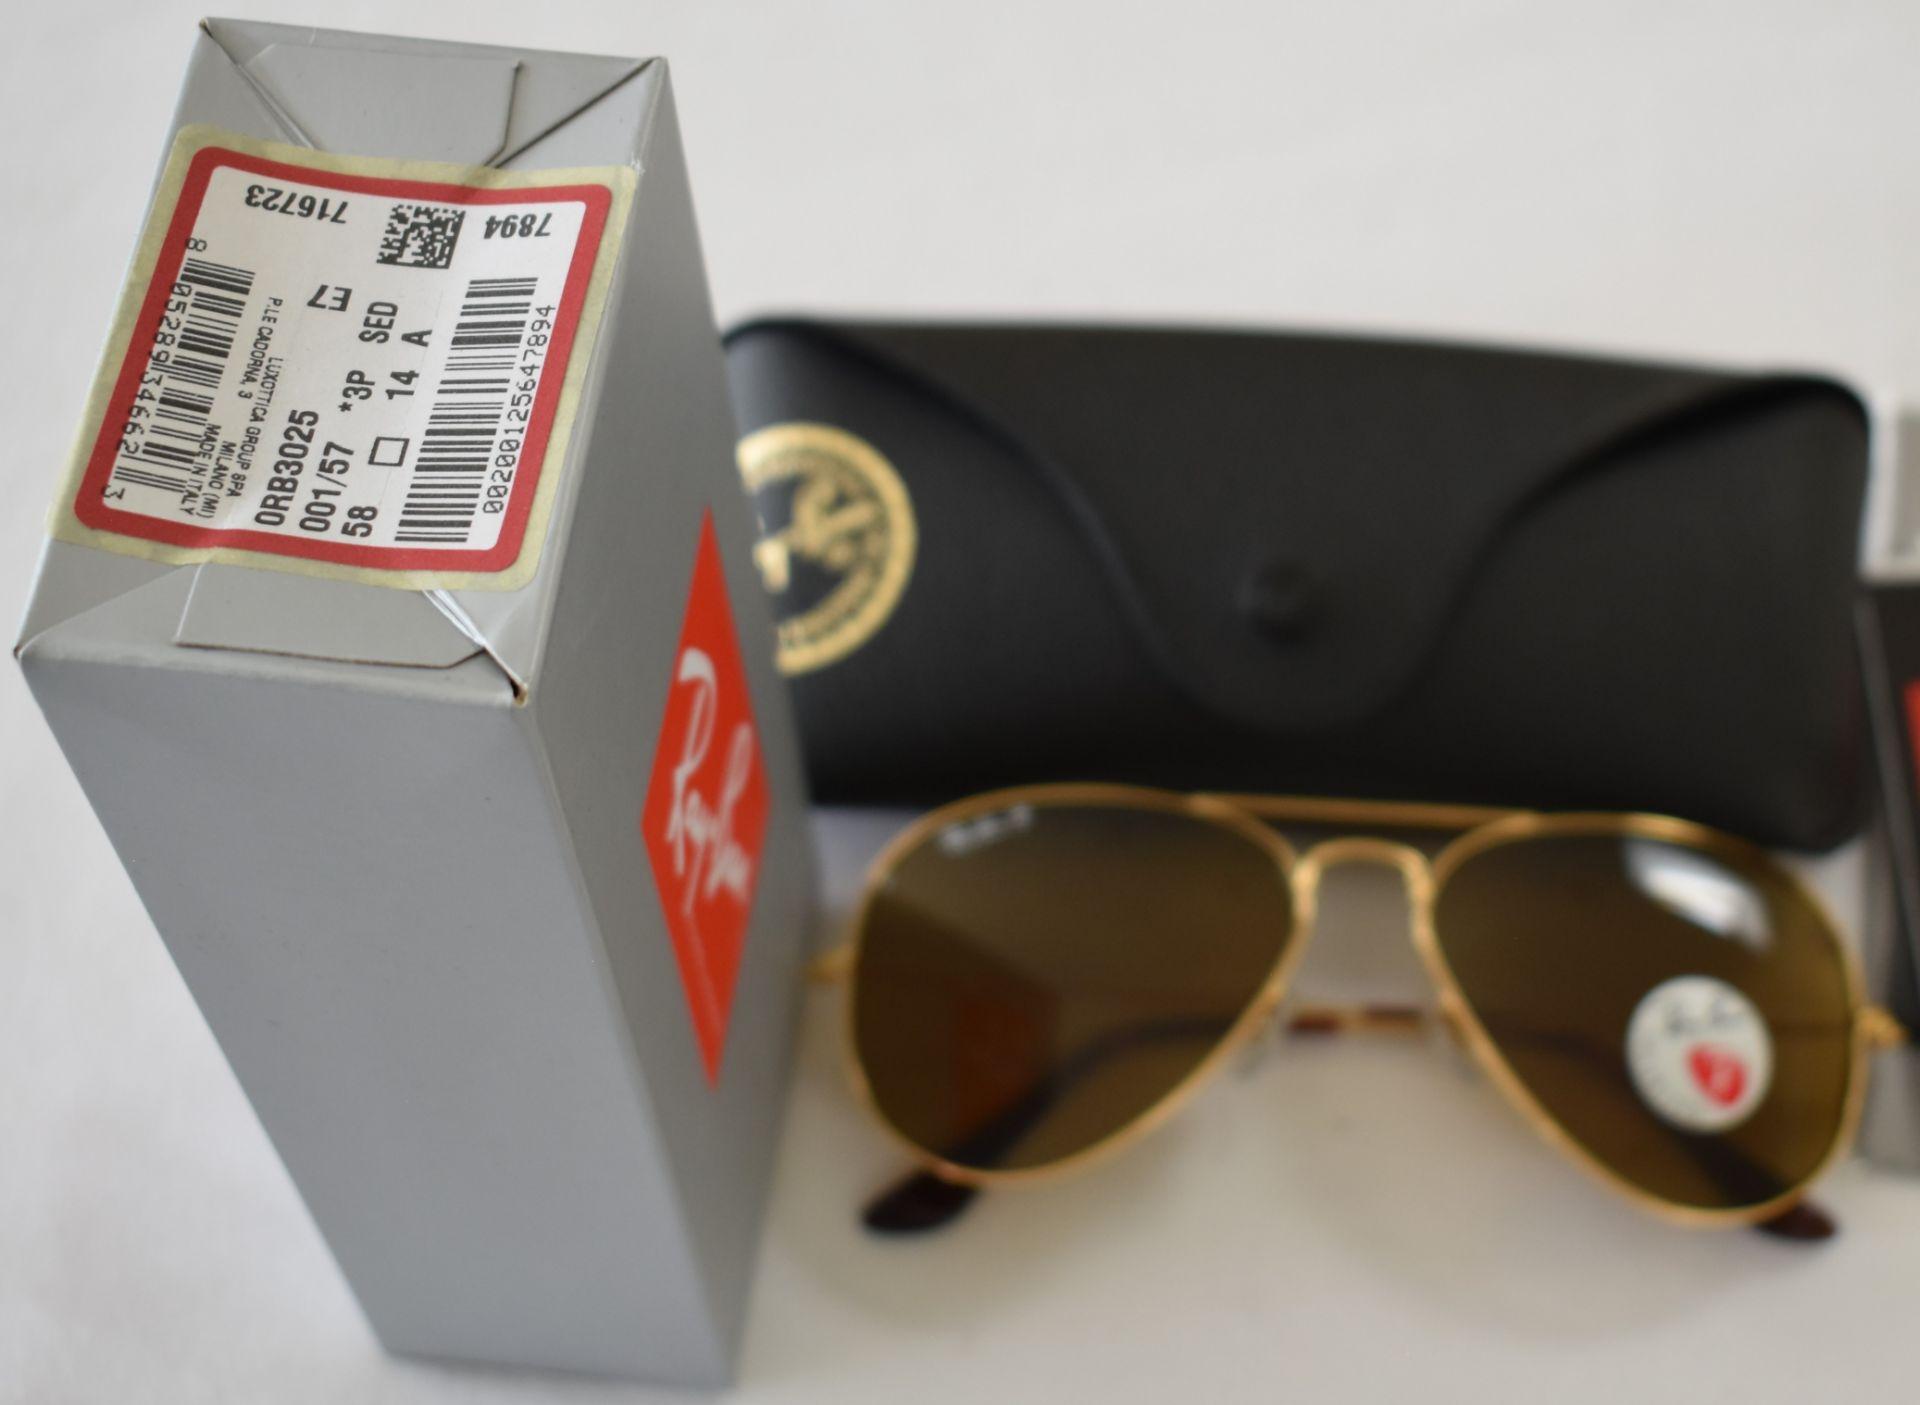 Ray Ban Sunglasses ORB3025 001/57 *3P - Image 2 of 2